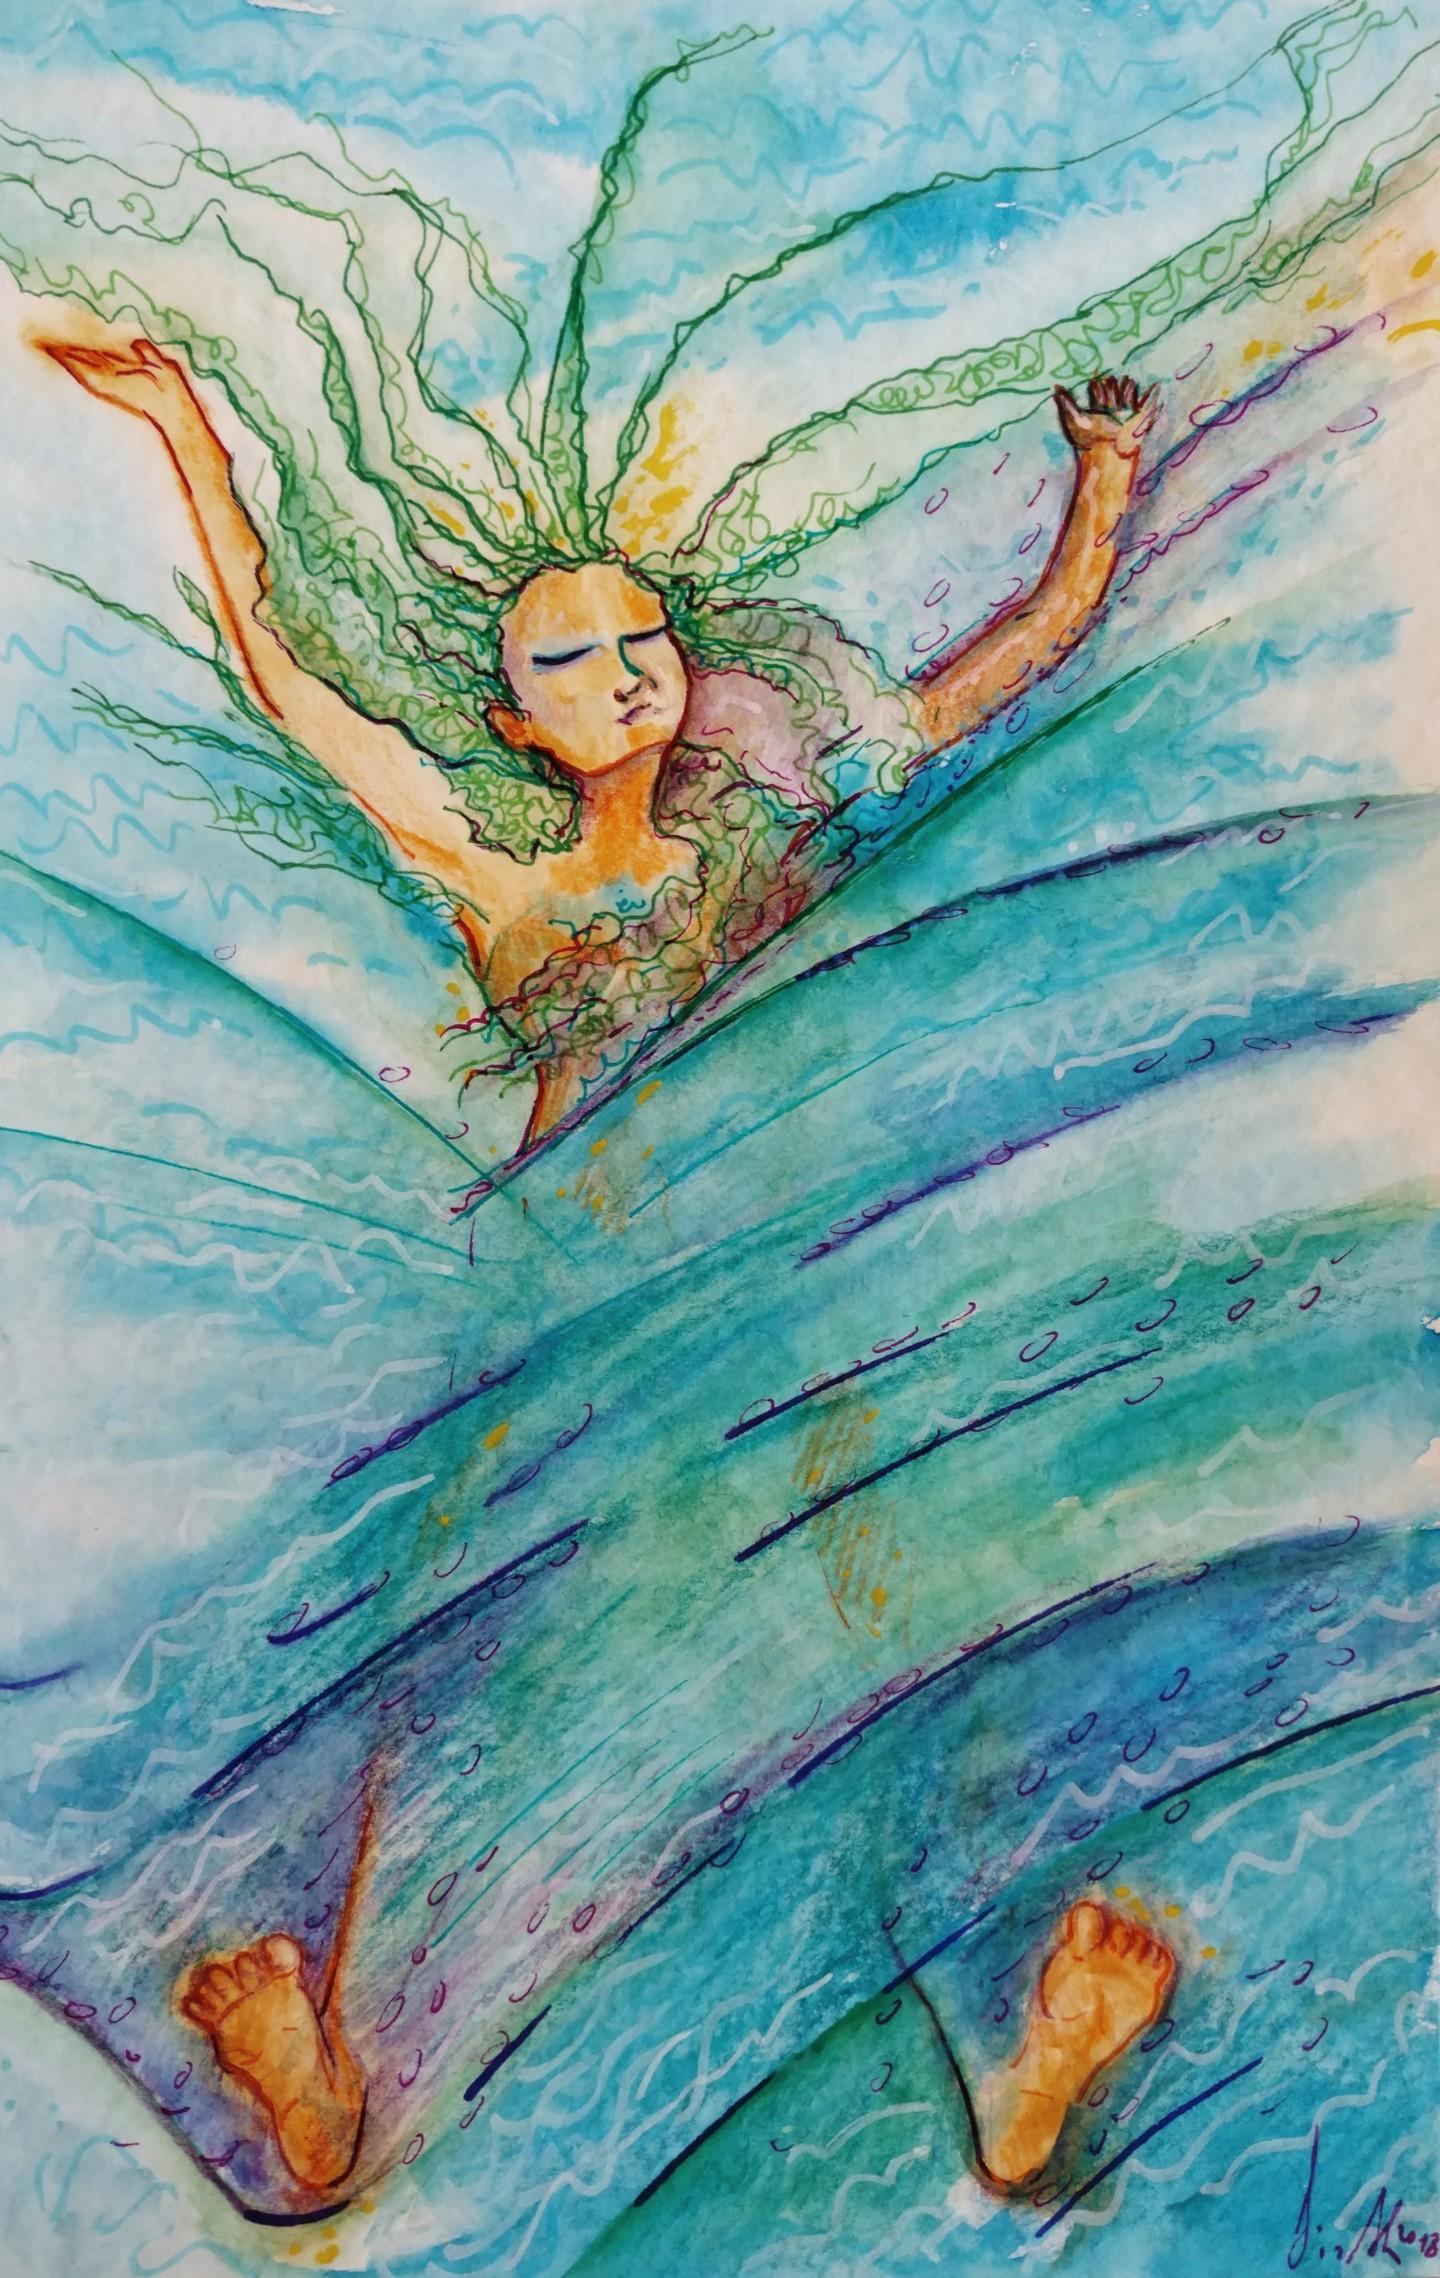 Gioia Albano - Femme Océan (Donna oceano)